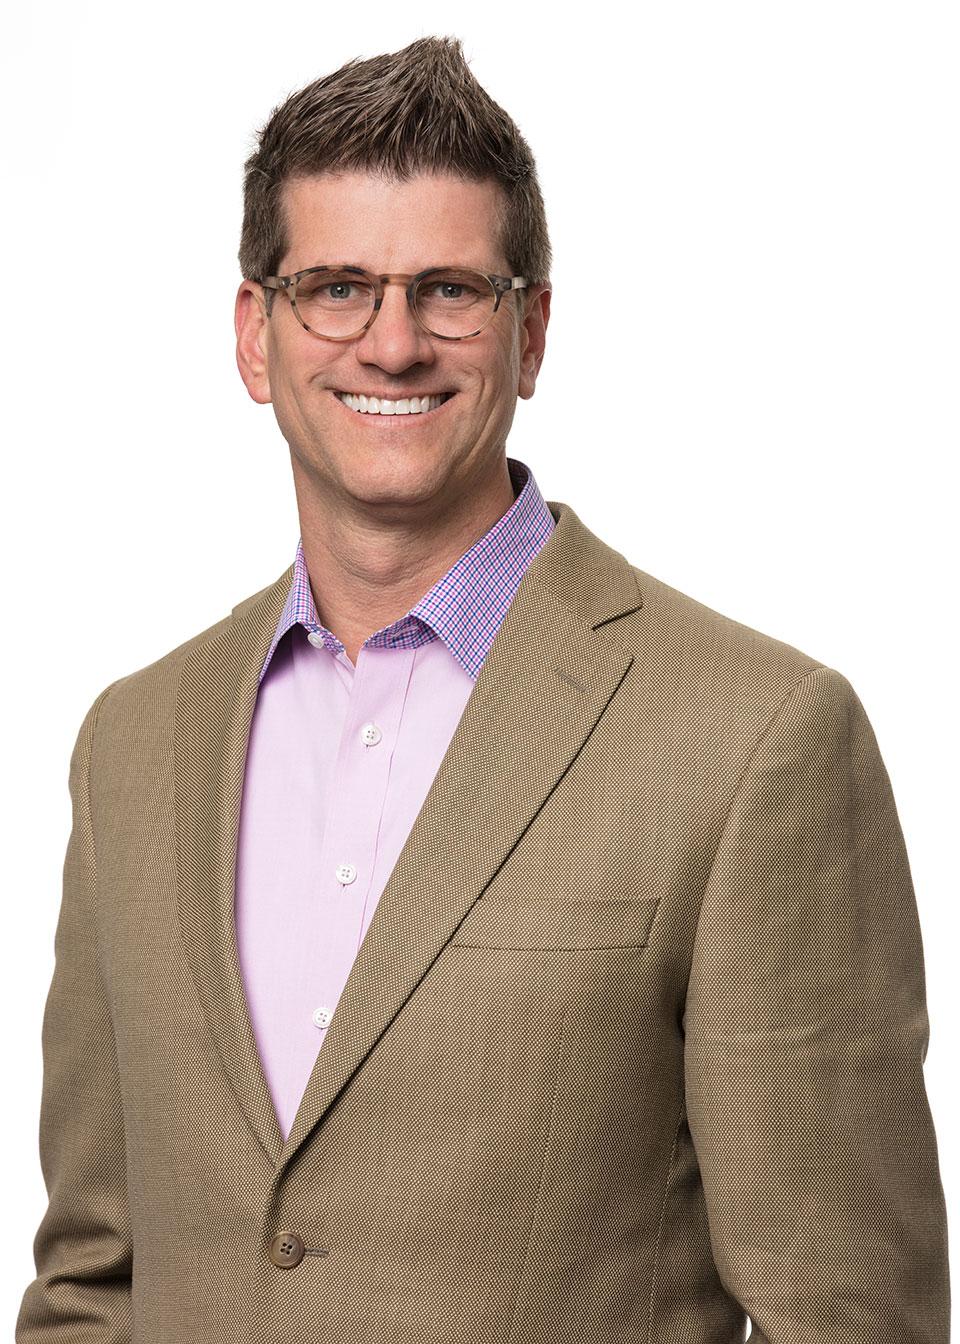 Scott Miller of FranklinCovey